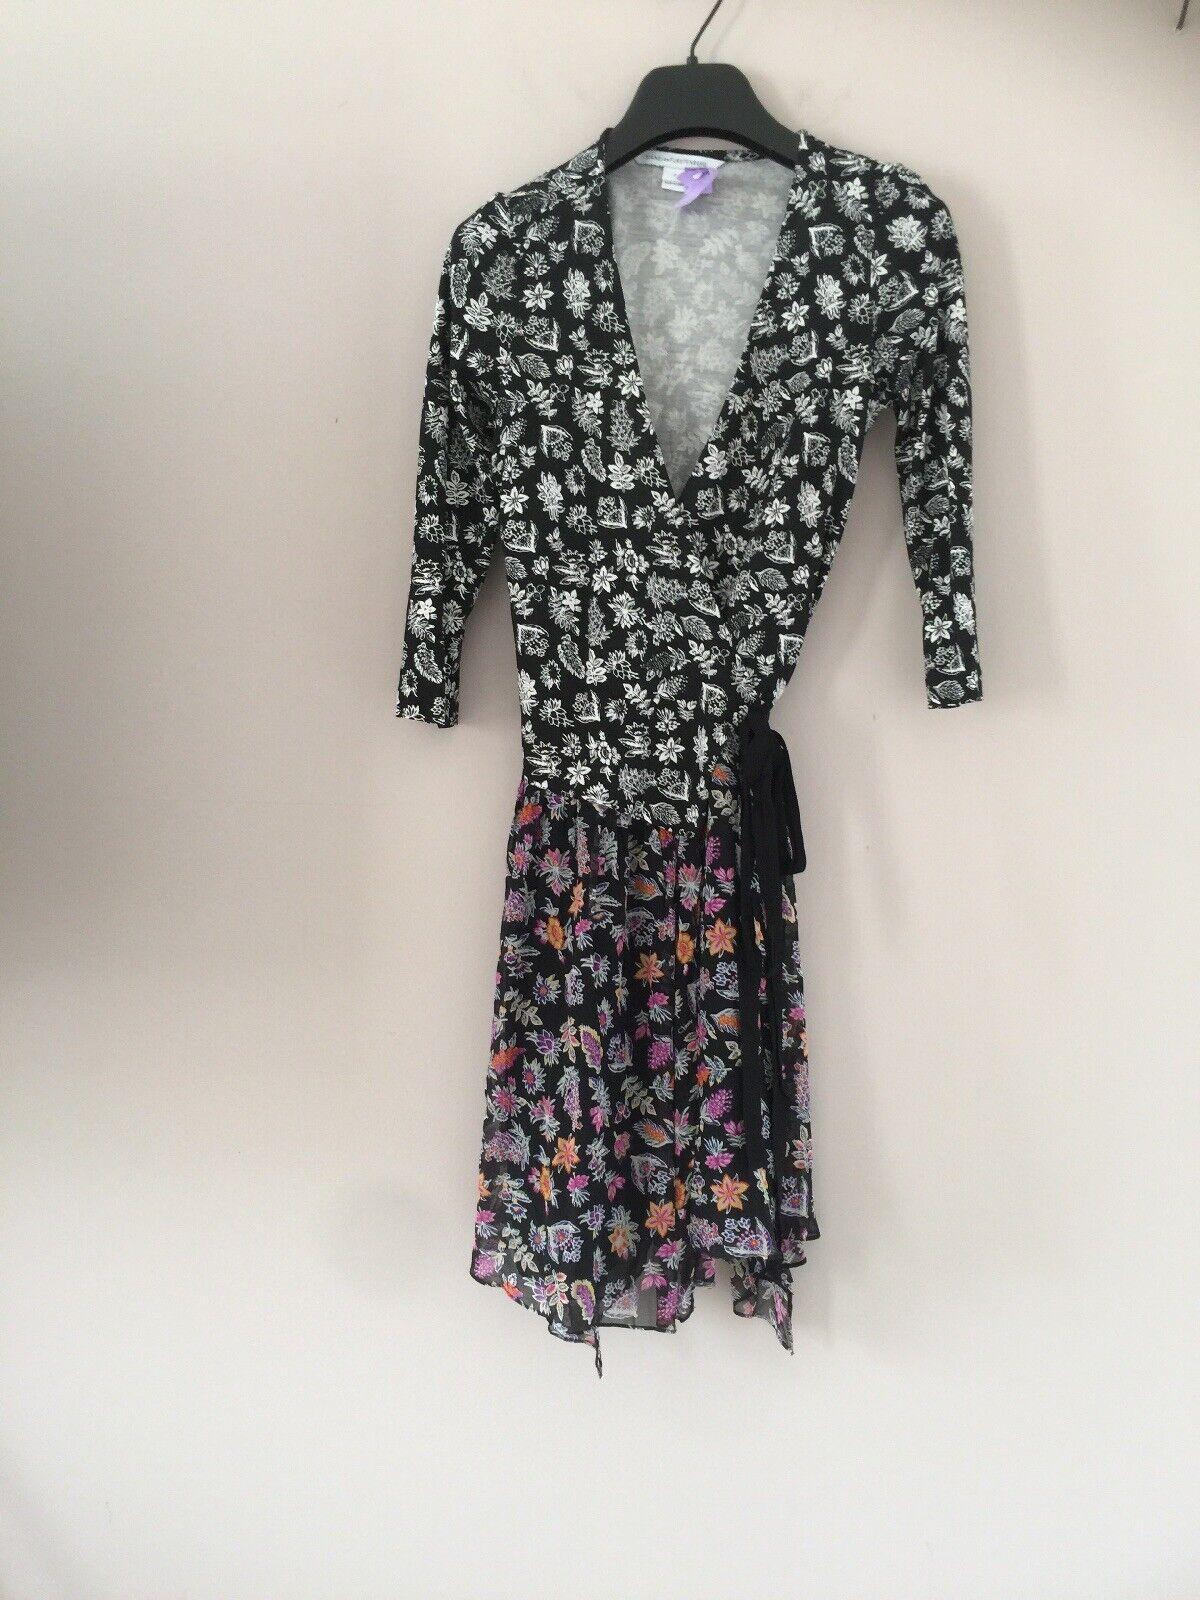 Dvf Dress - image 4